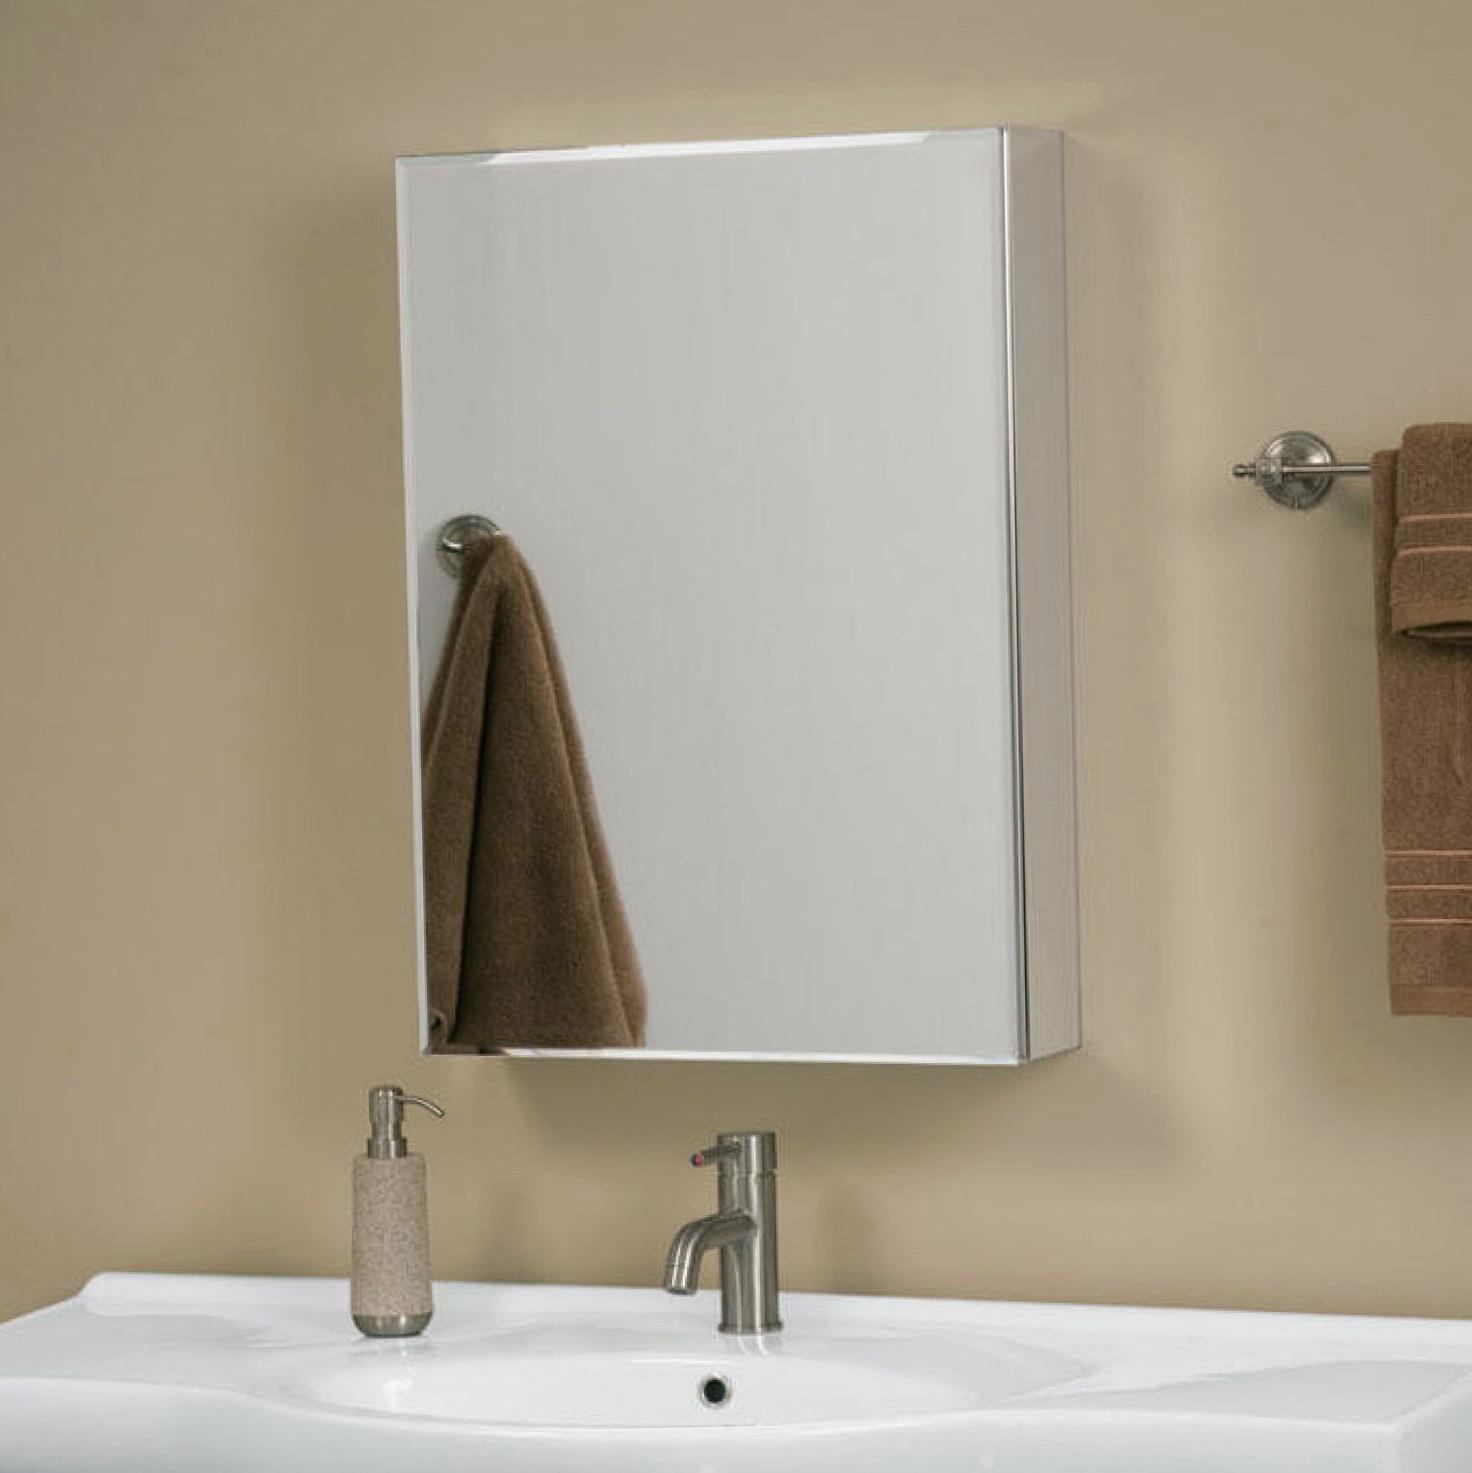 Small Medicine Cabinet With Mirror